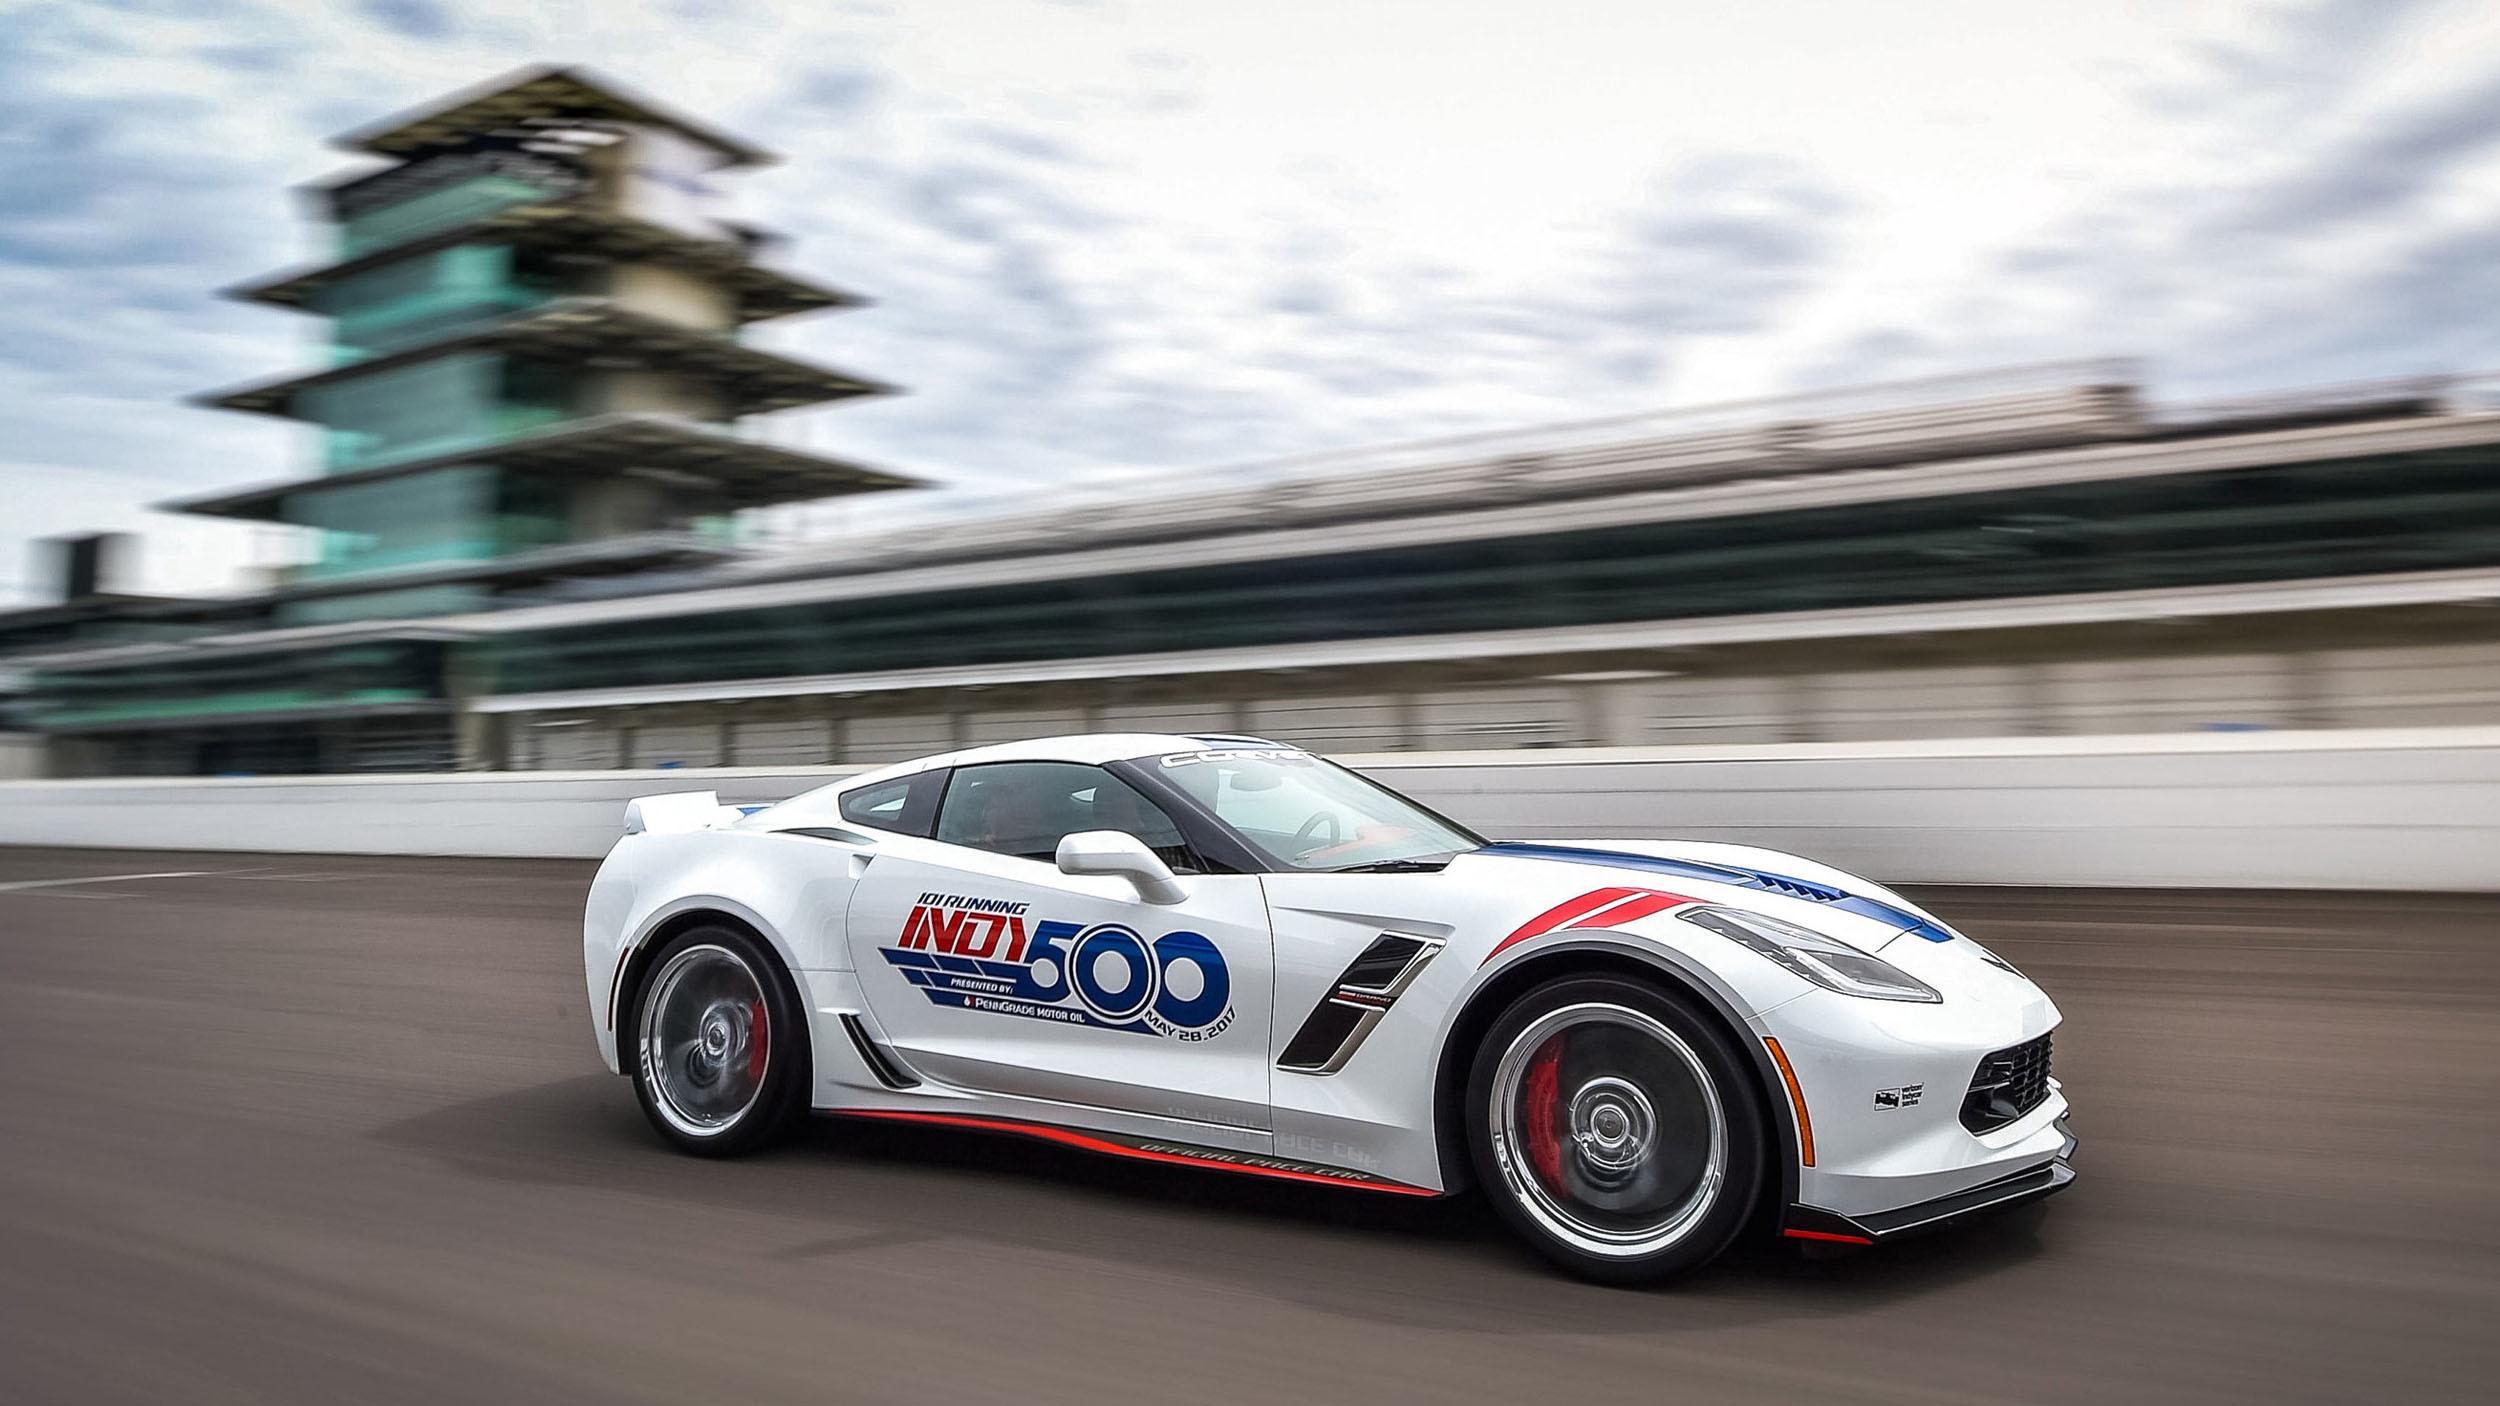 Chevrolet Corvette Grand Sport pace car Indy 500 (8)